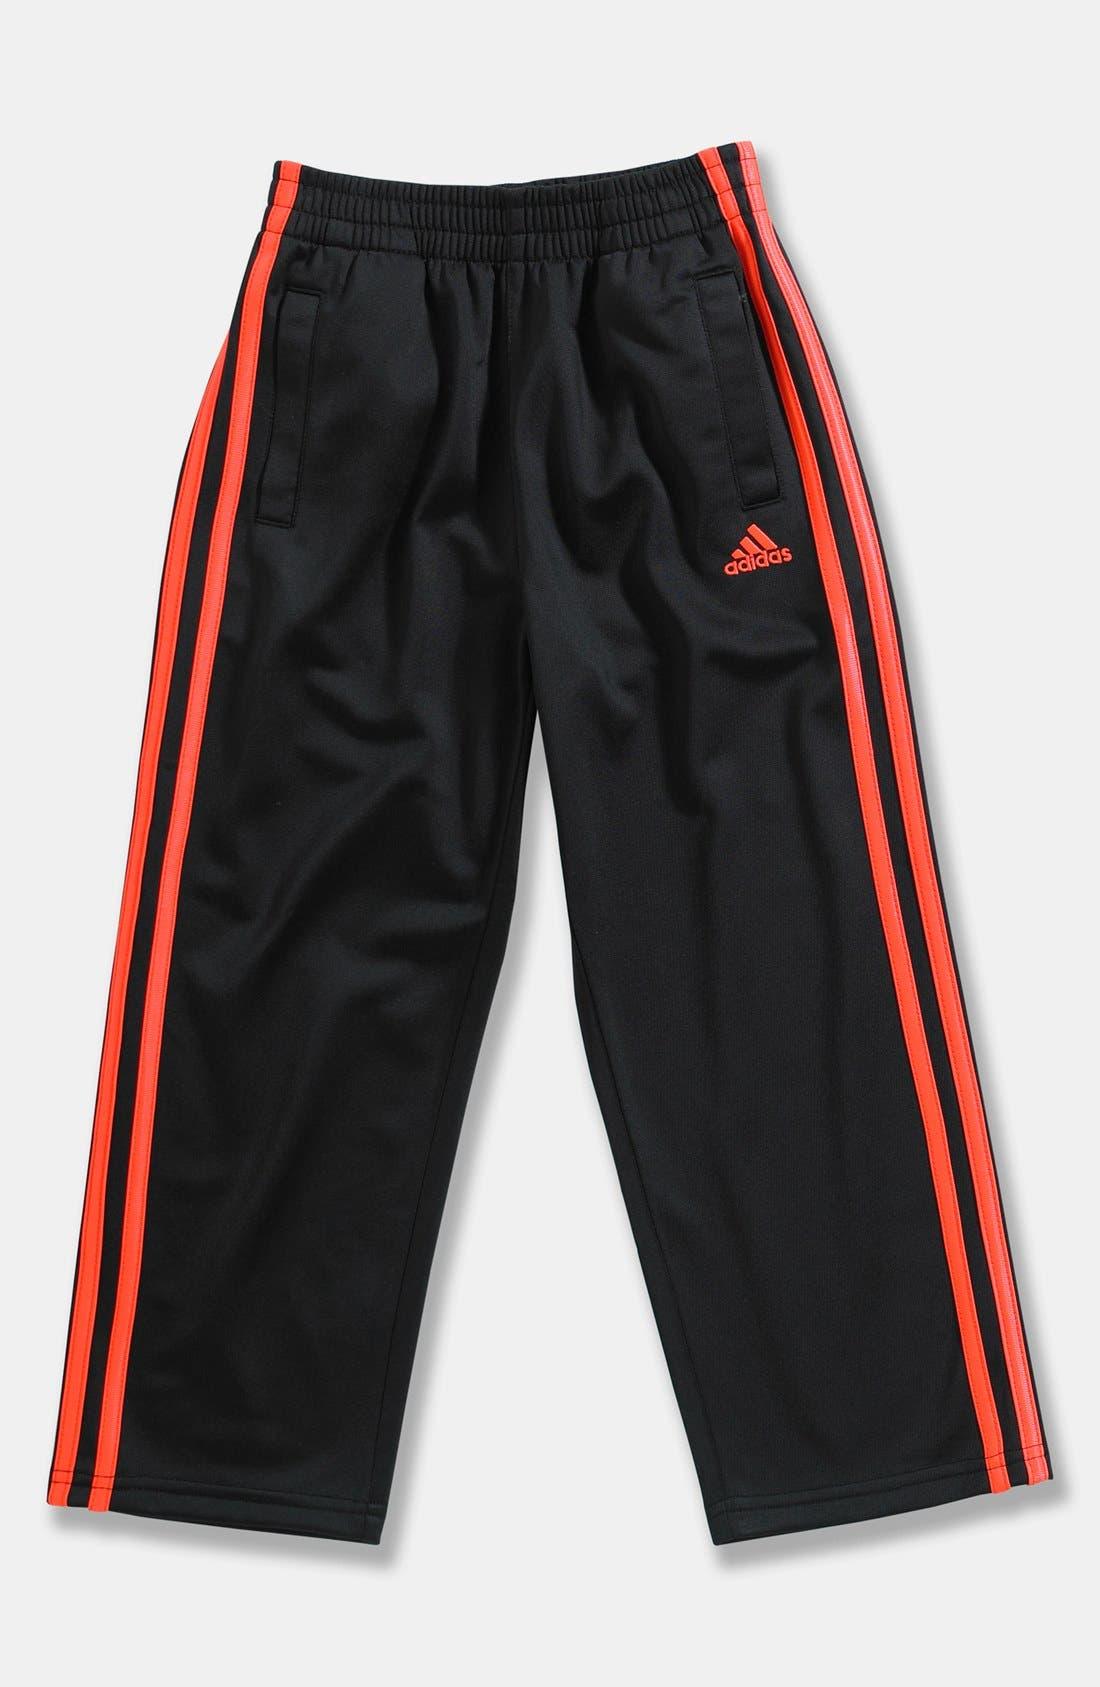 Main Image - adidas 'Impact' Pants (Little Boys)